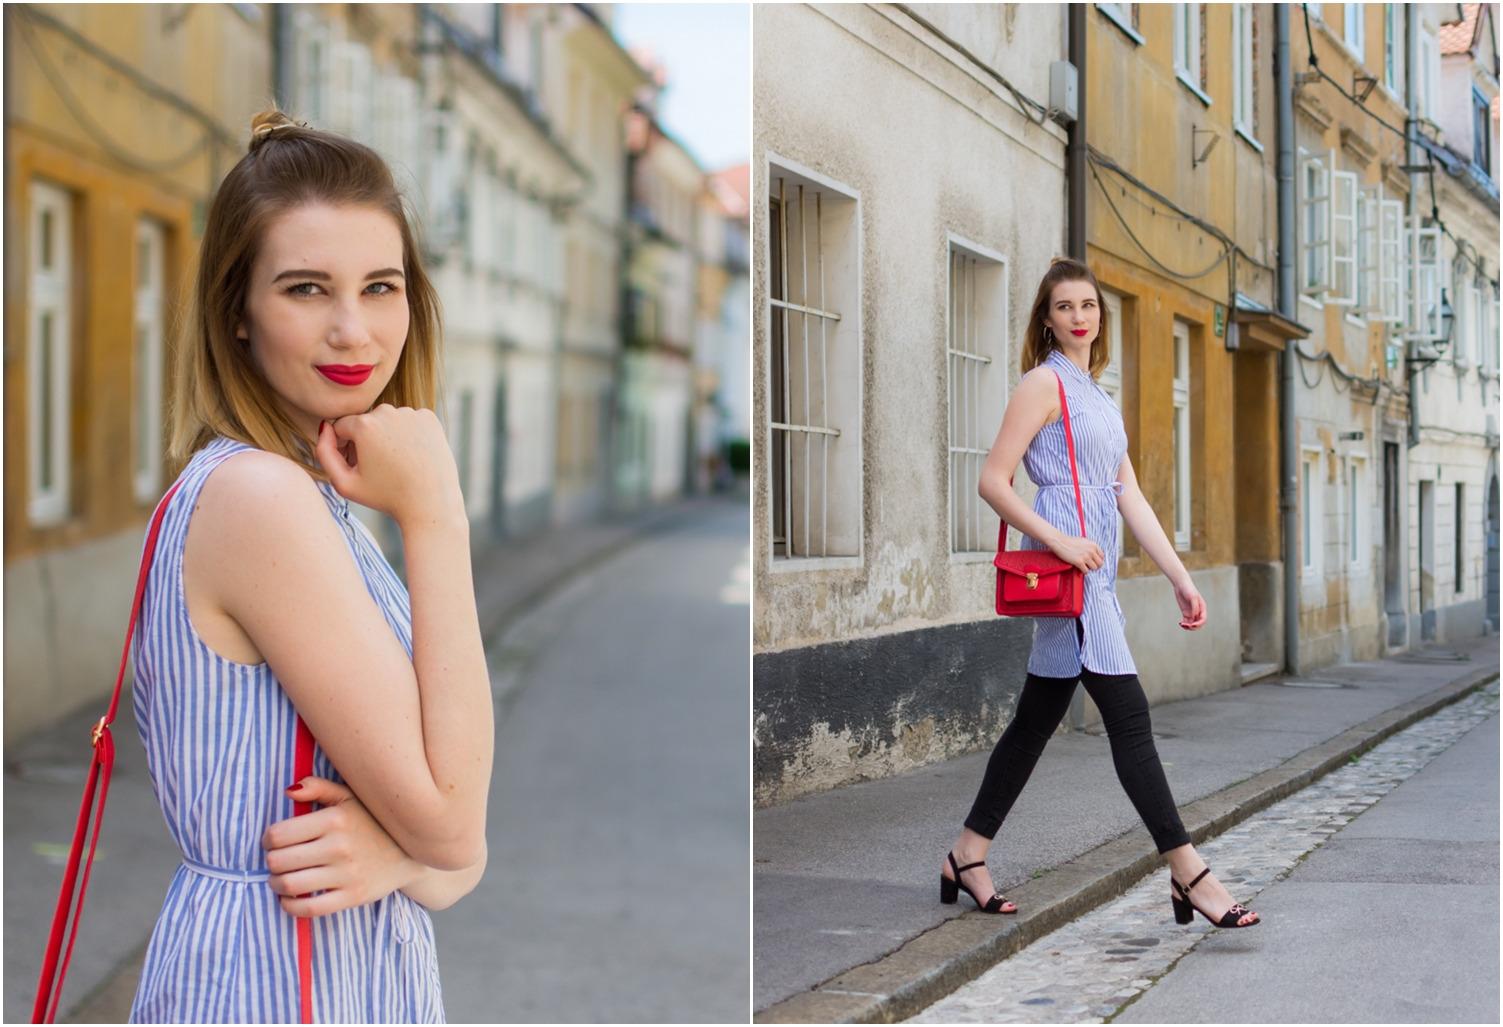 Zalabell_fashion_summer_blue_shirt_red_bag_2